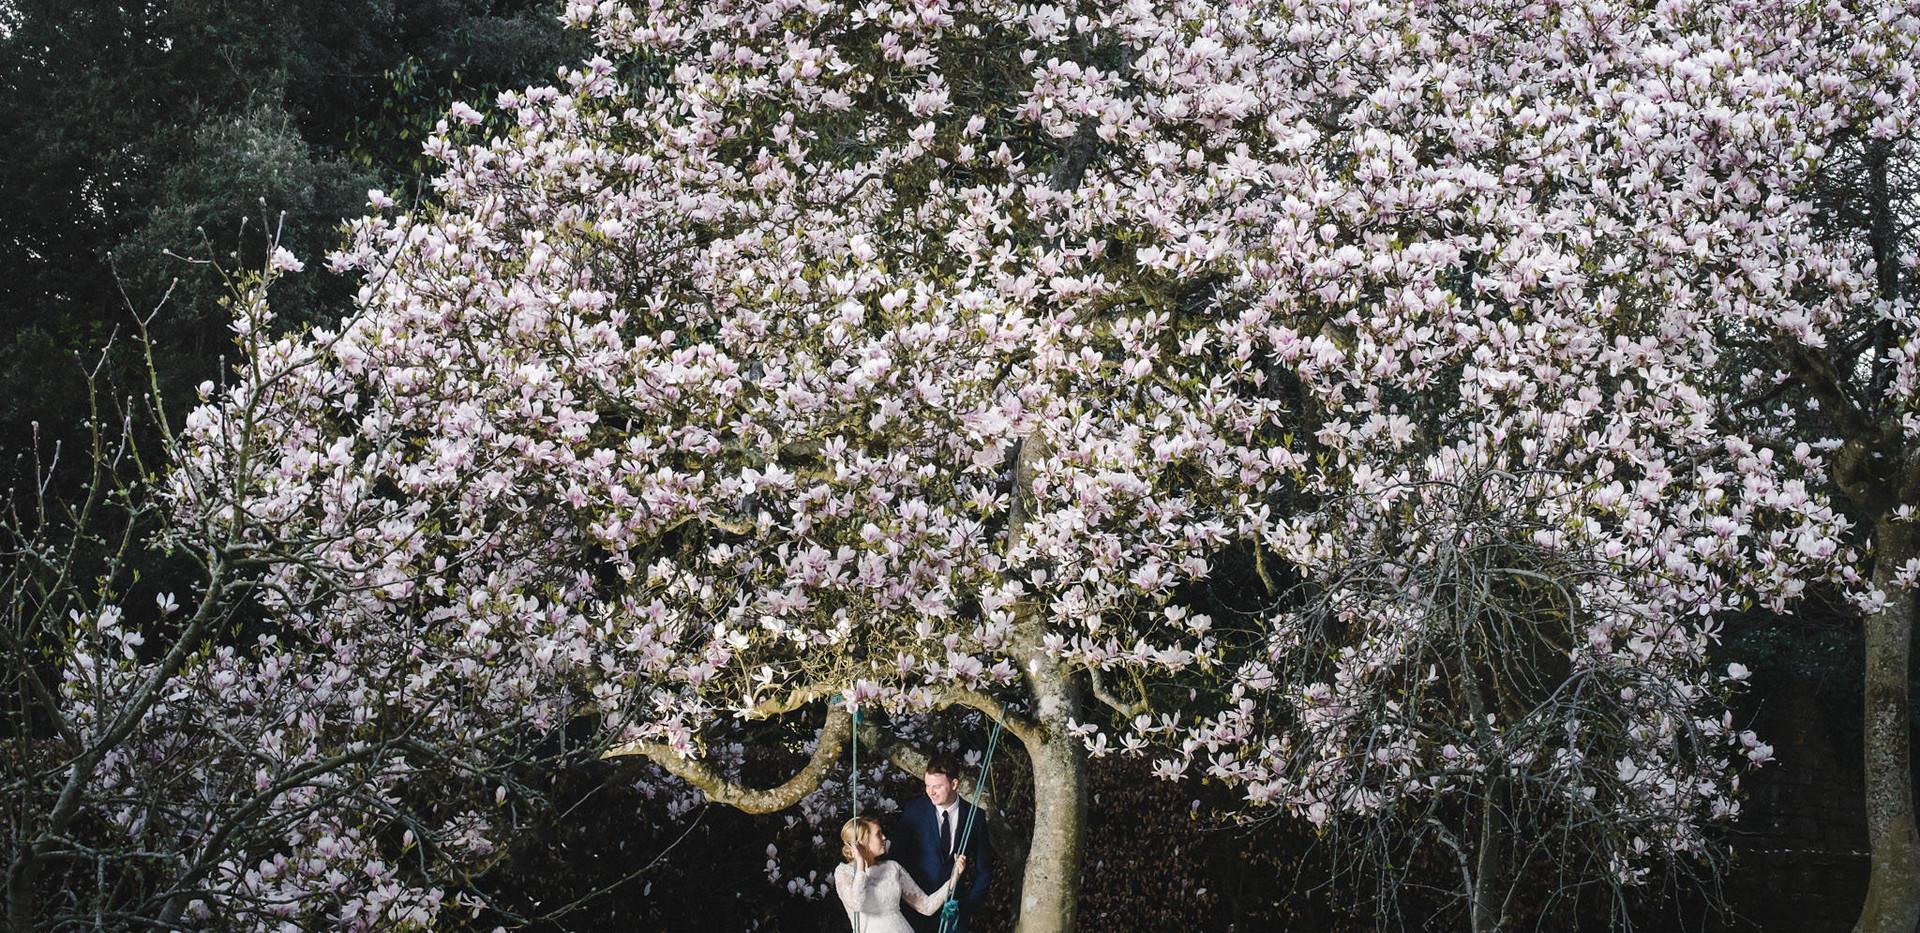 Beautiful Magnolia tree in the Orchard